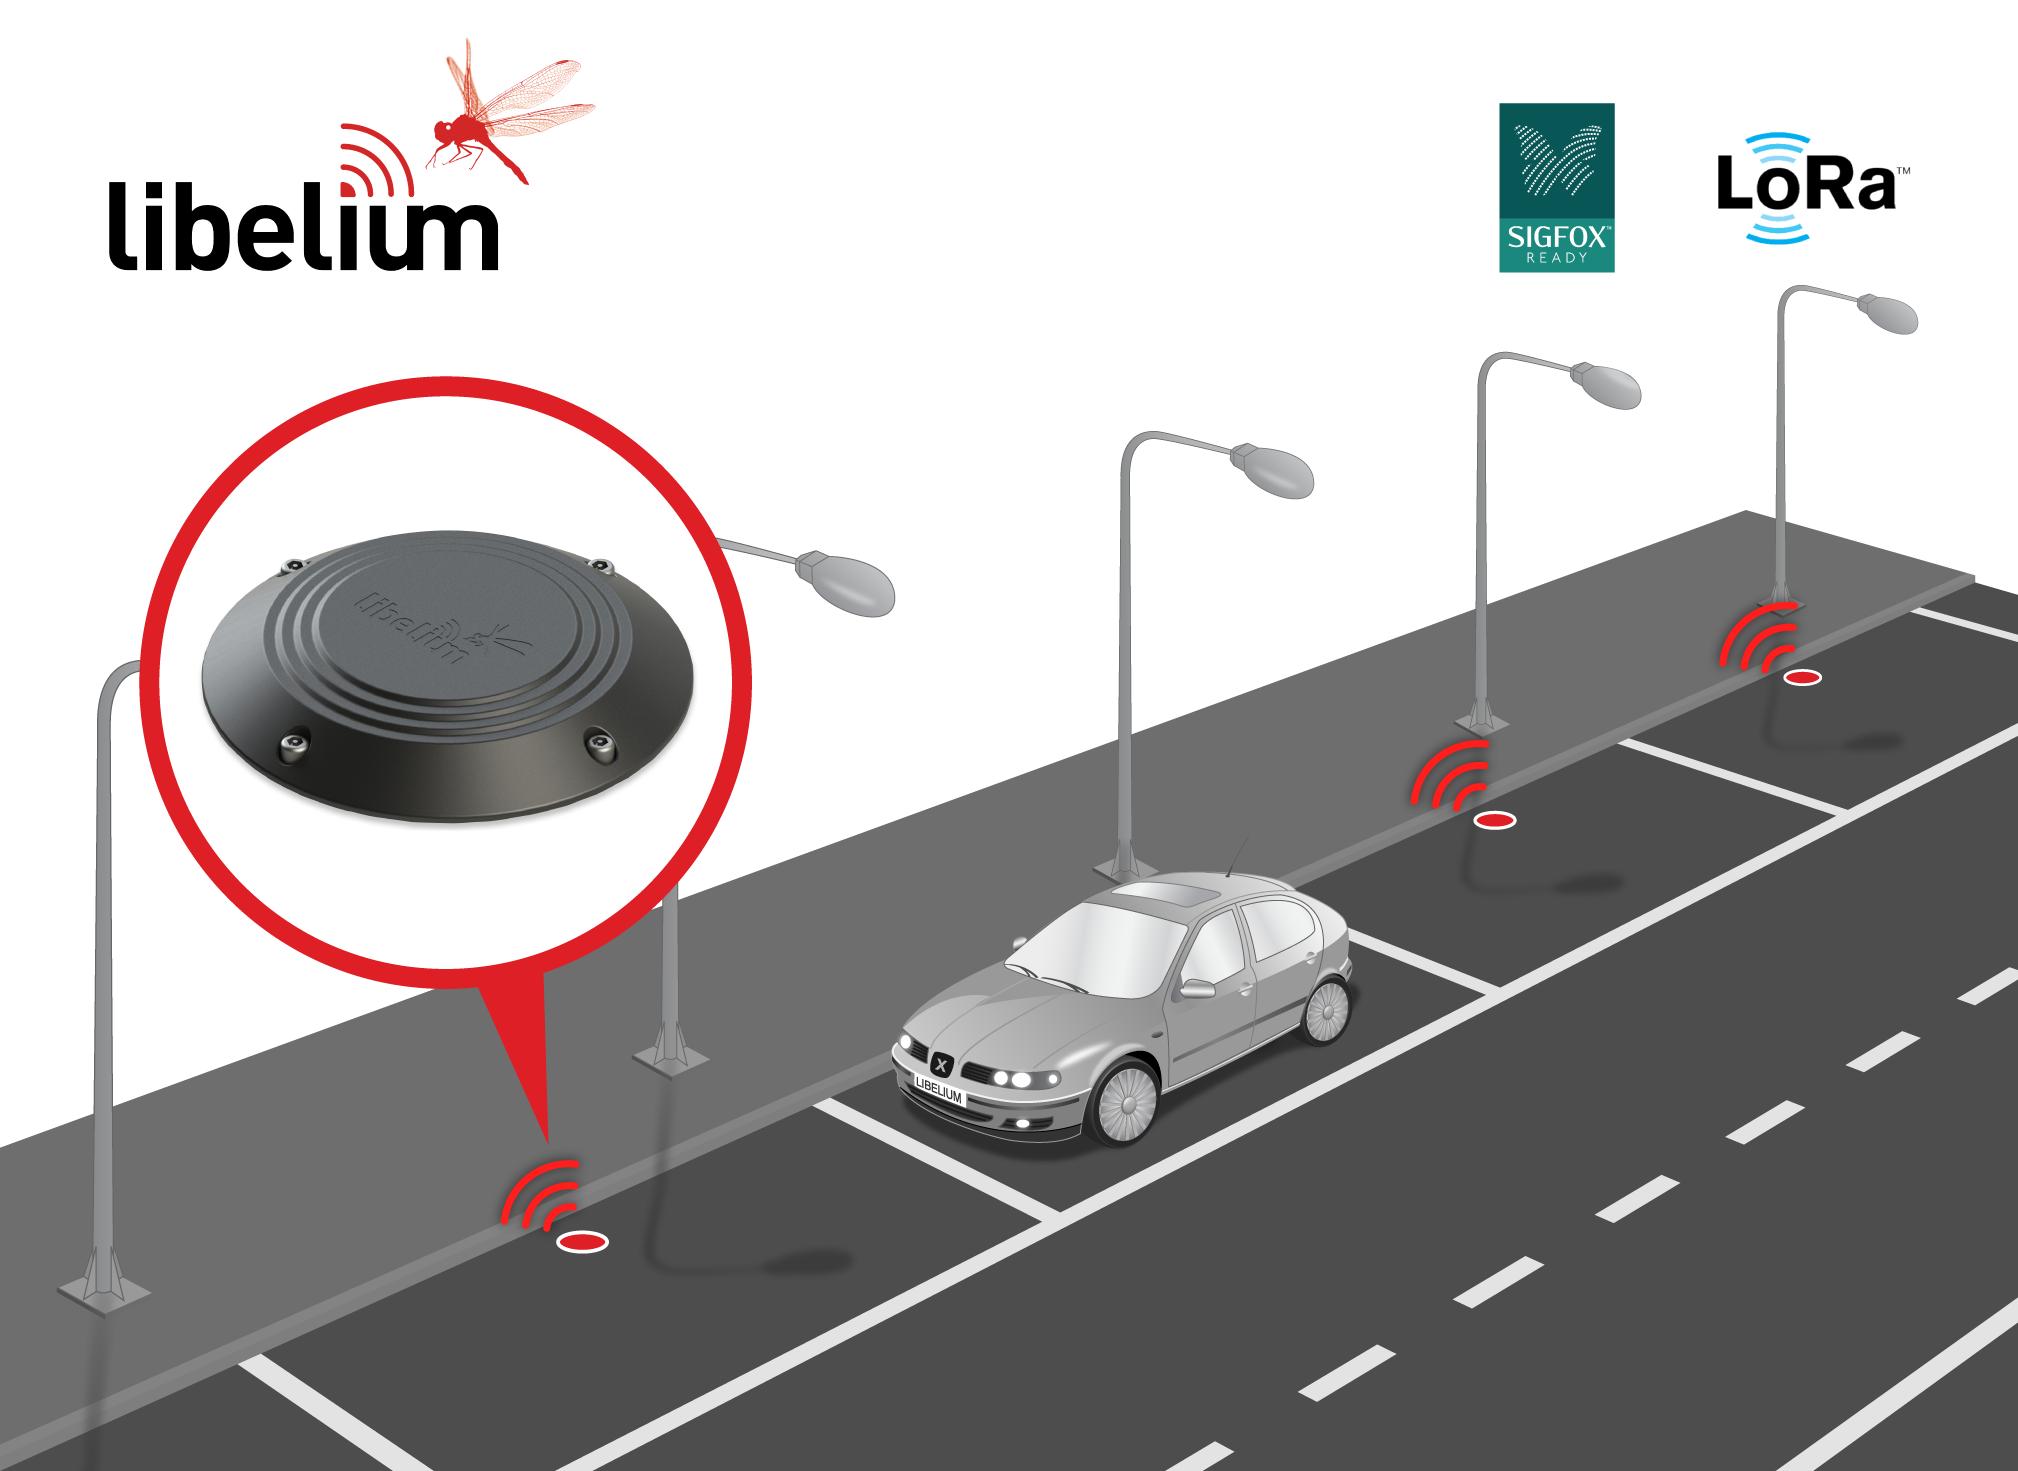 Libelium Iot Solutions Finalist At 2016 Best Of Sensors